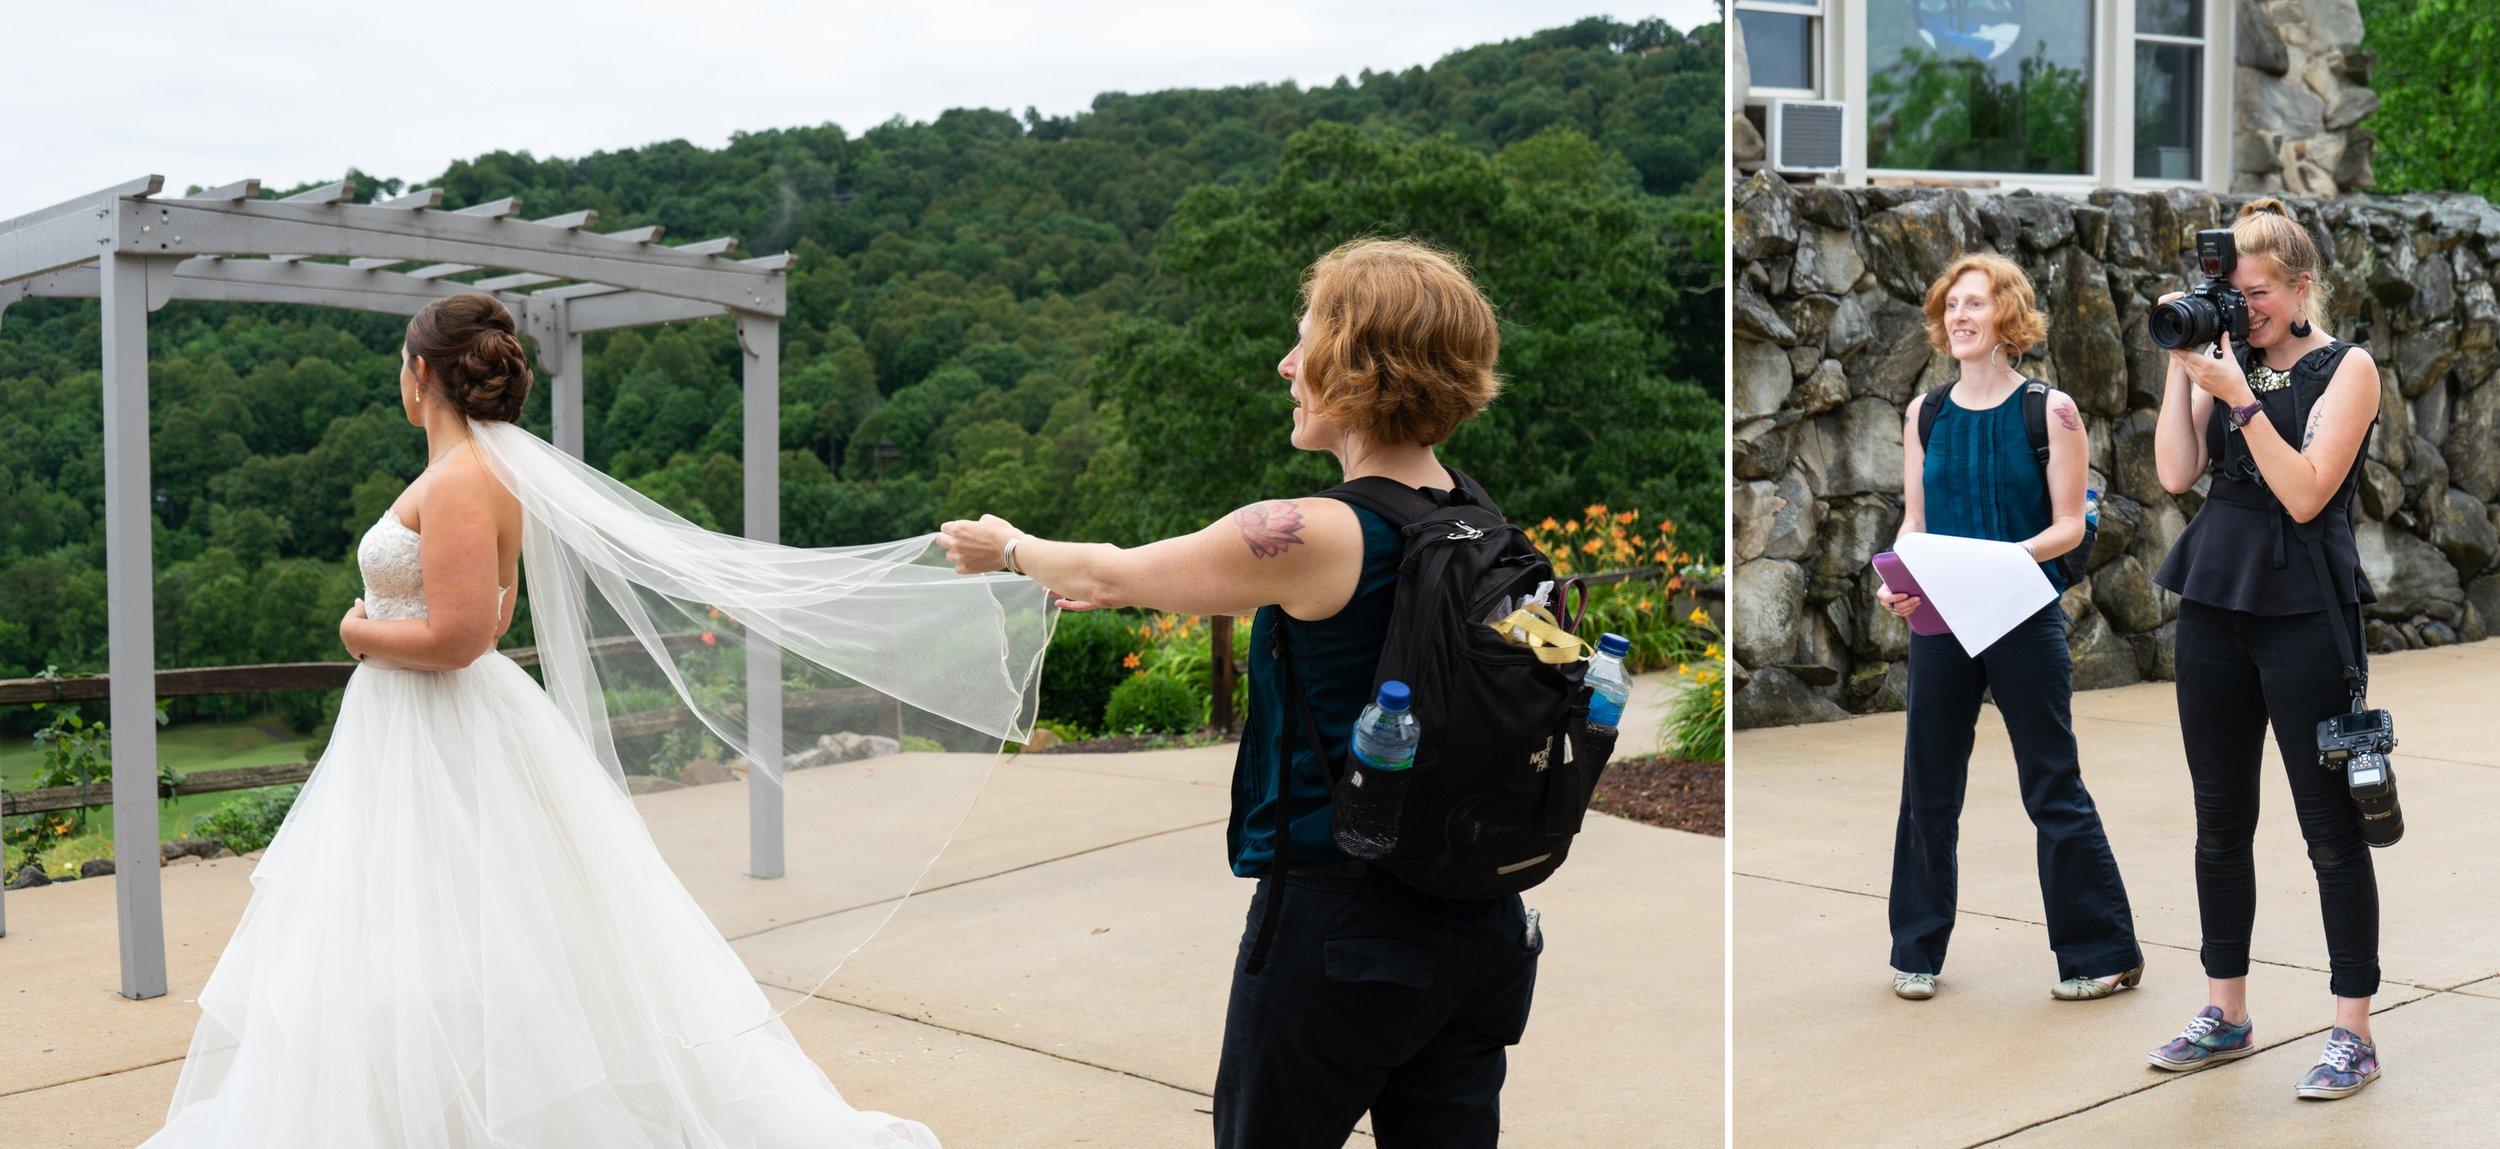 High Vista Weddings - Asheville Wedding 2 31.jpg